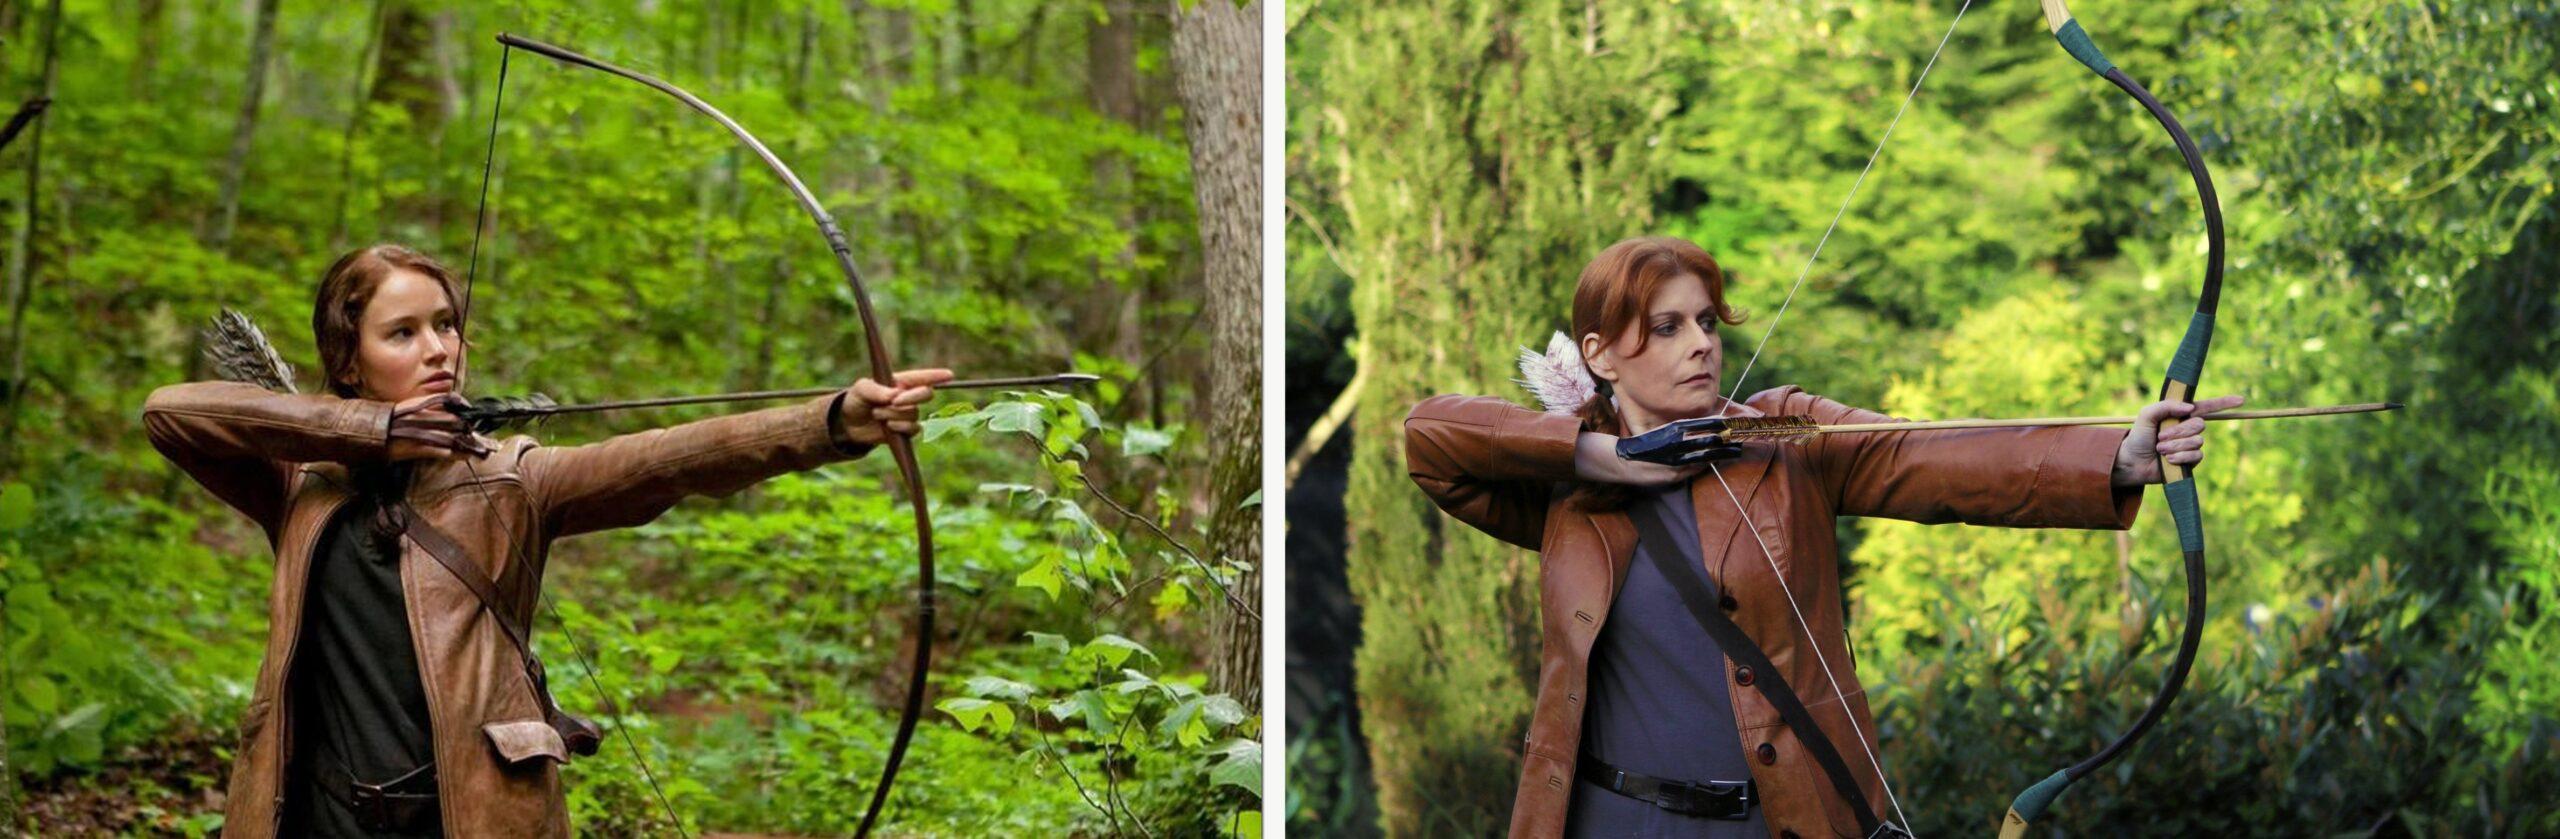 Katniss Everdeen – The Hunger Games / Helen Wallace-Iles – The Lockdown Games